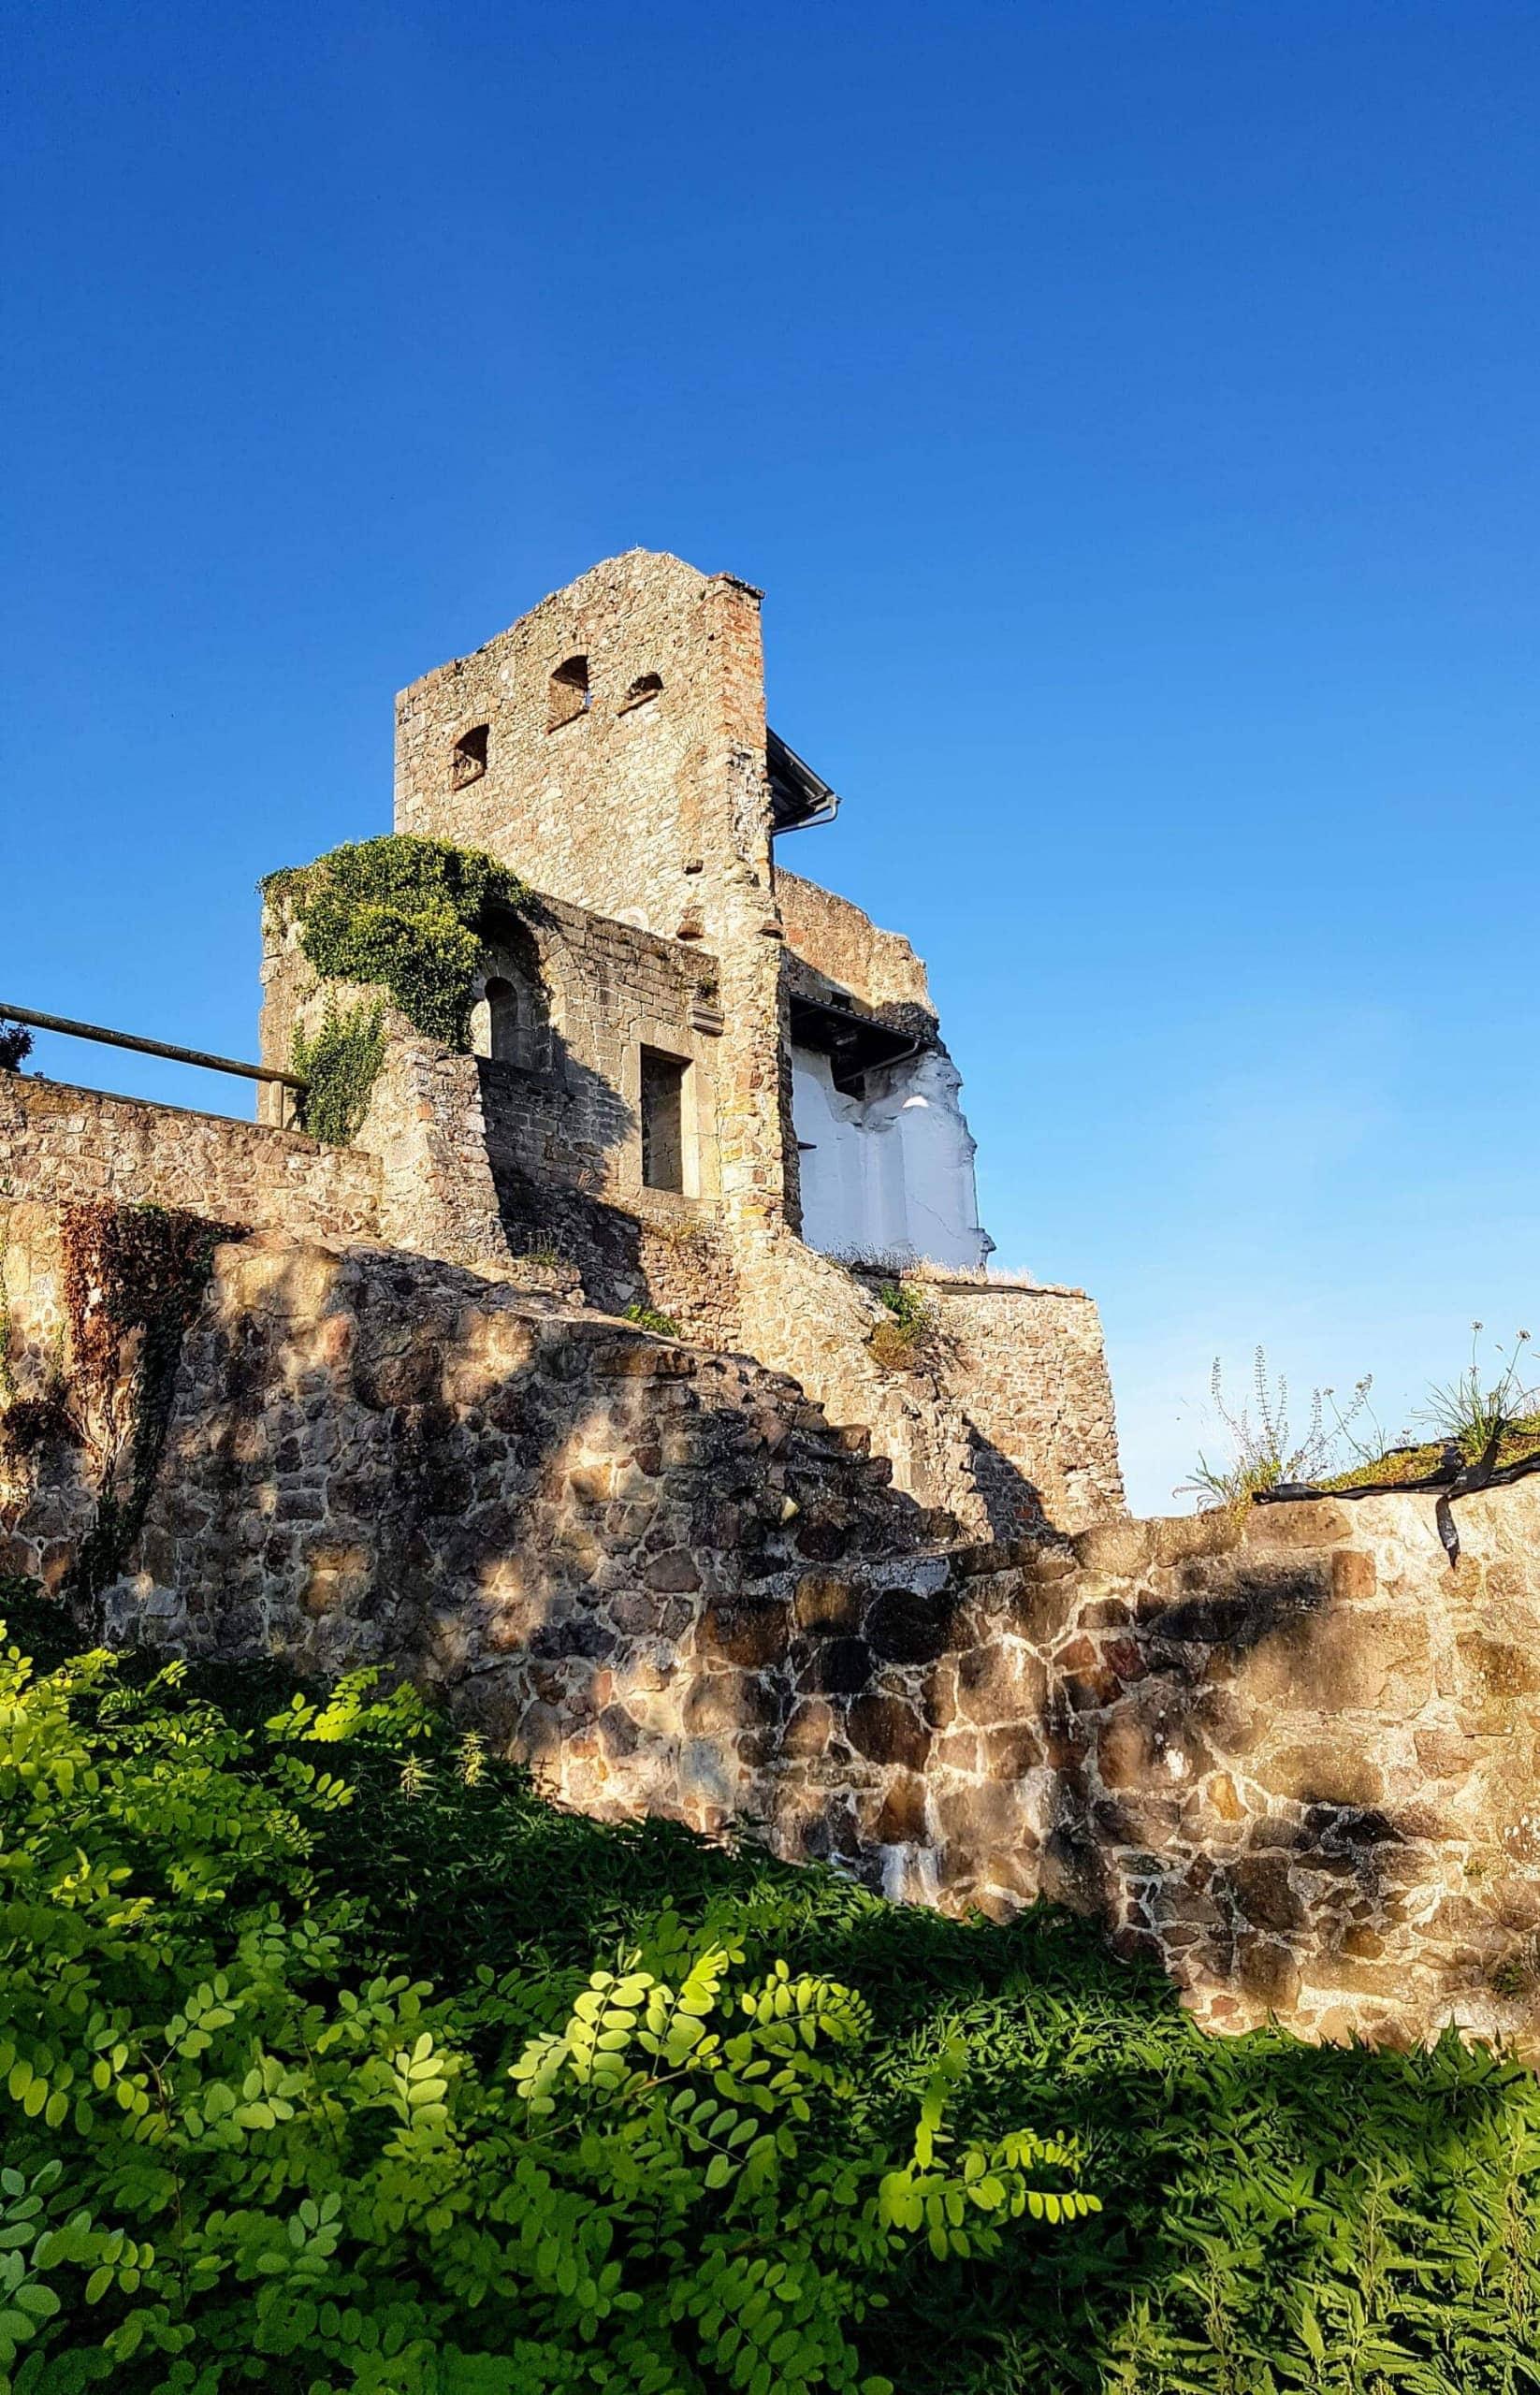 Blizz Leserreporter Ausflugstipp Nr. 1 - Burgruine Donaustauf